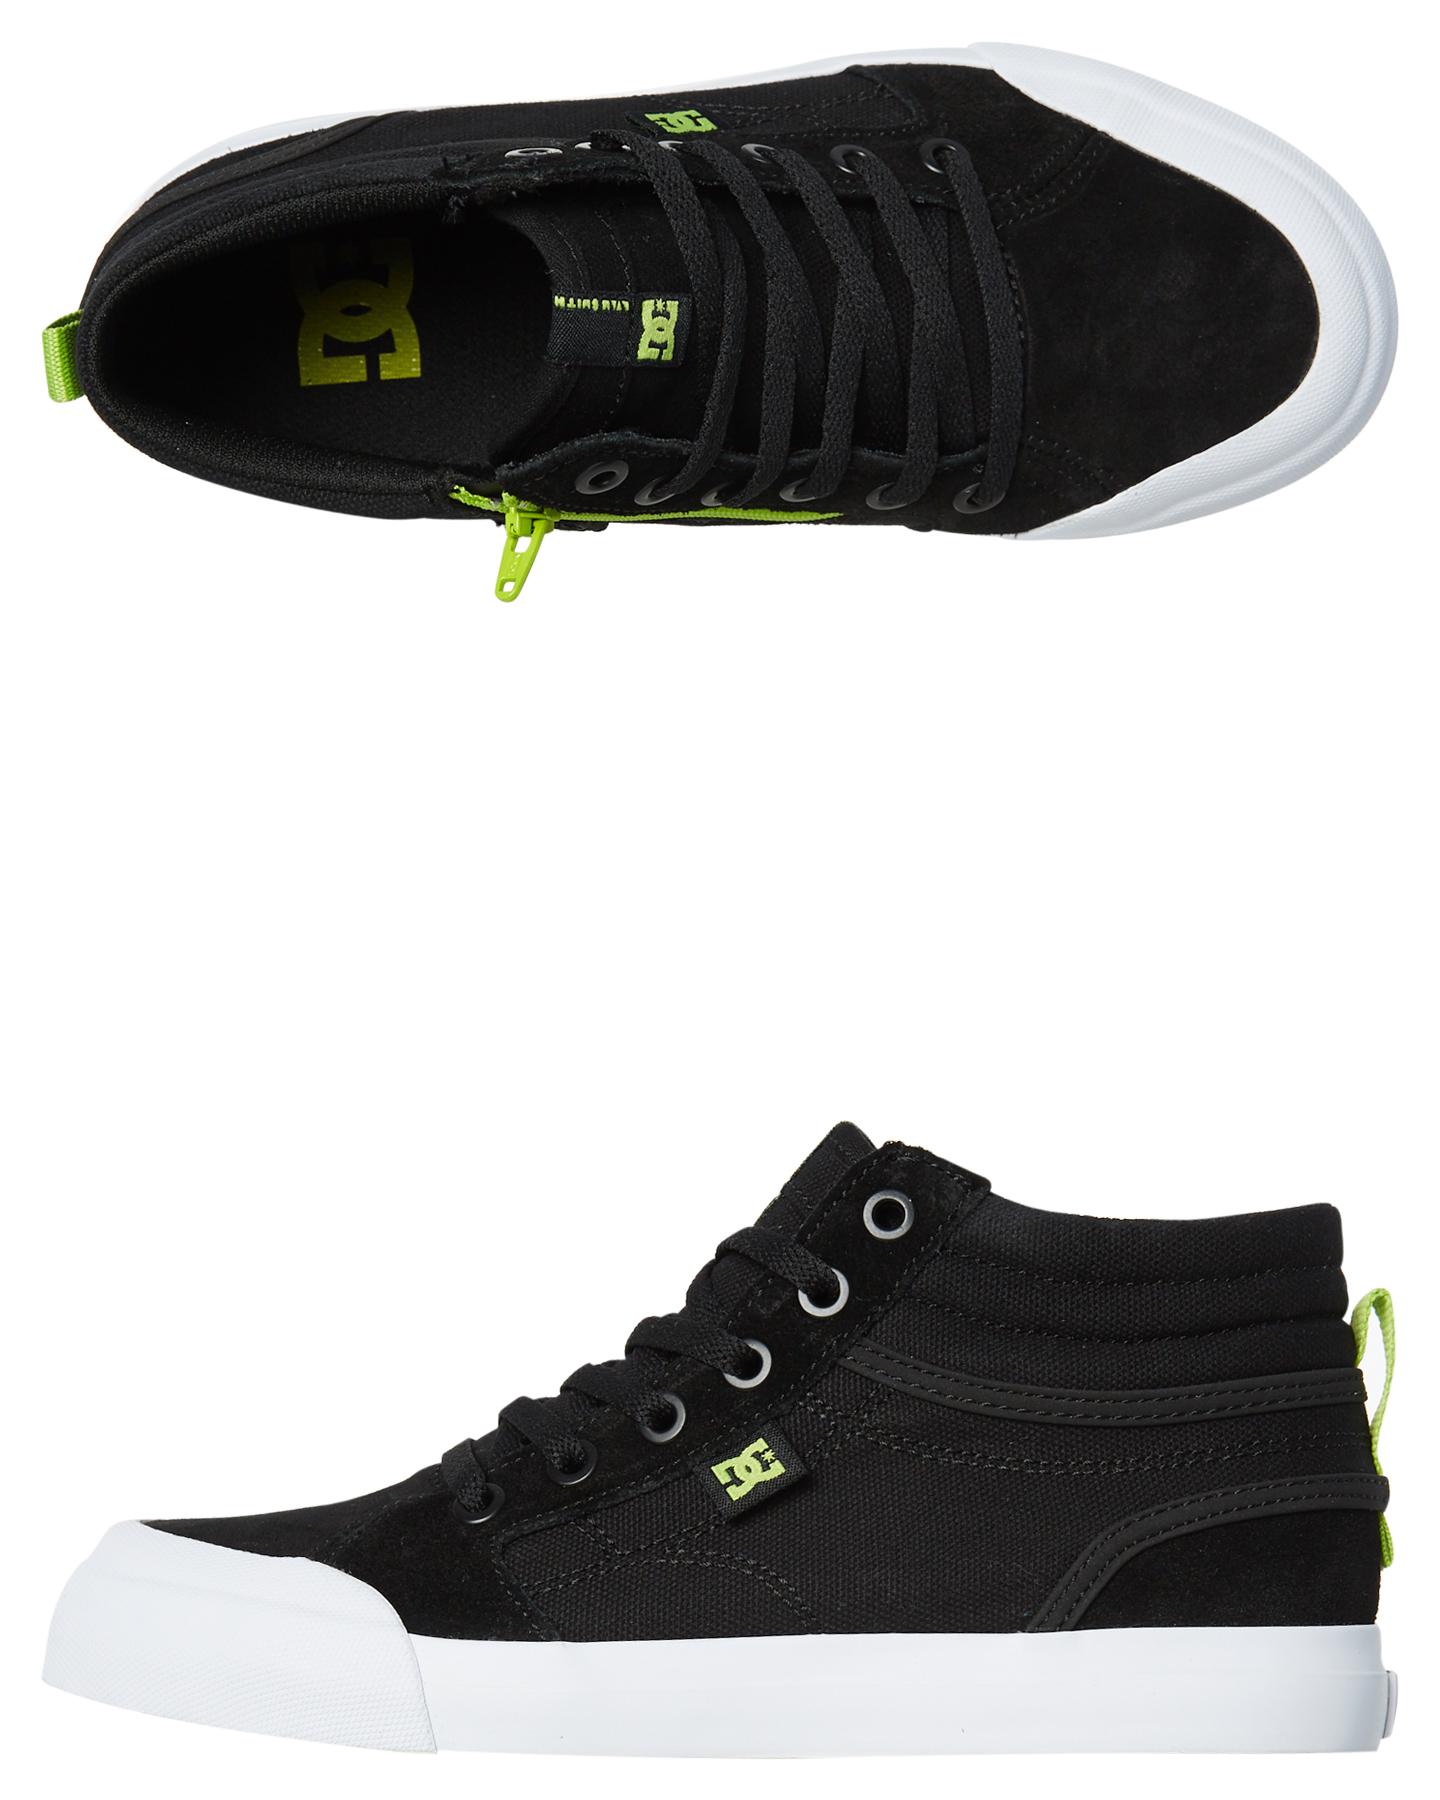 6f79bbb8a15c Dc Shoes Kids Boys Evan Hi Zip Shoe Black Lime Black Lime Baby Boys ...